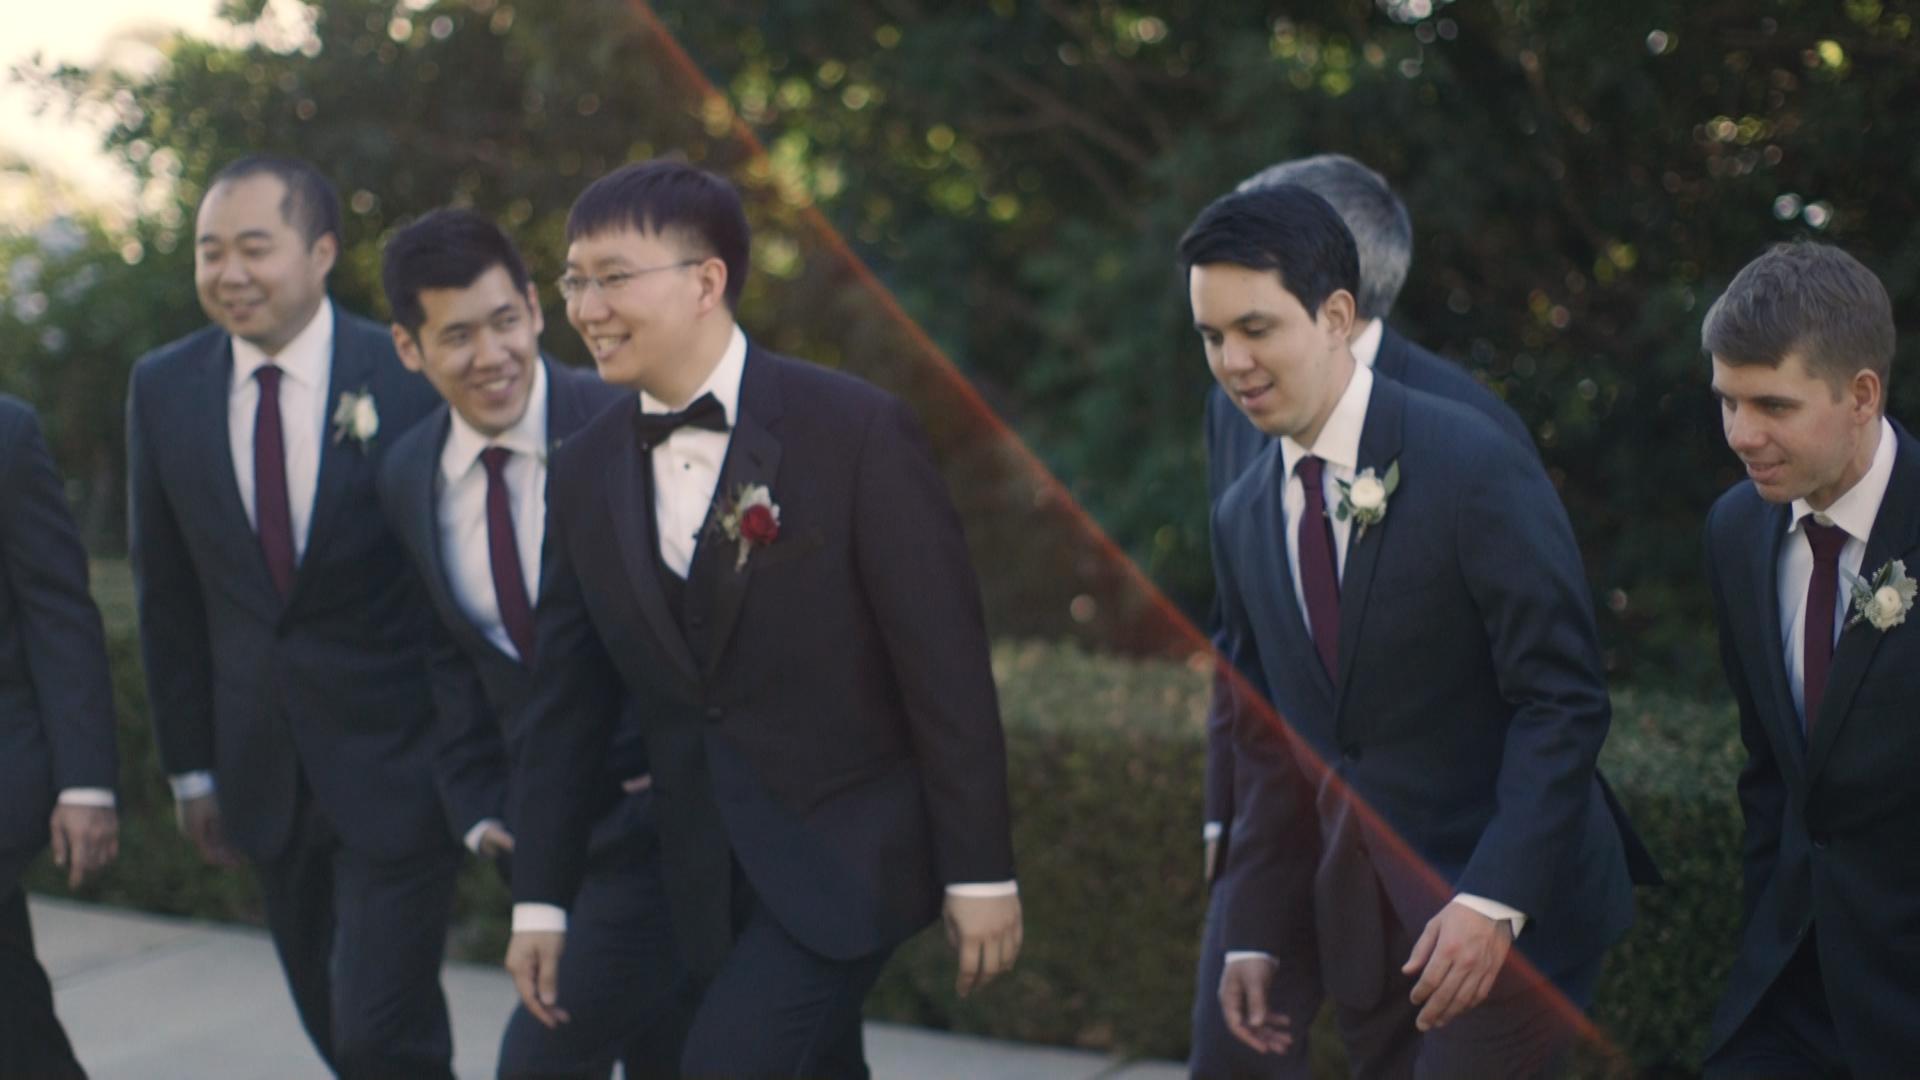 malibu-wedding-film-groomsmen.Still003.jpg